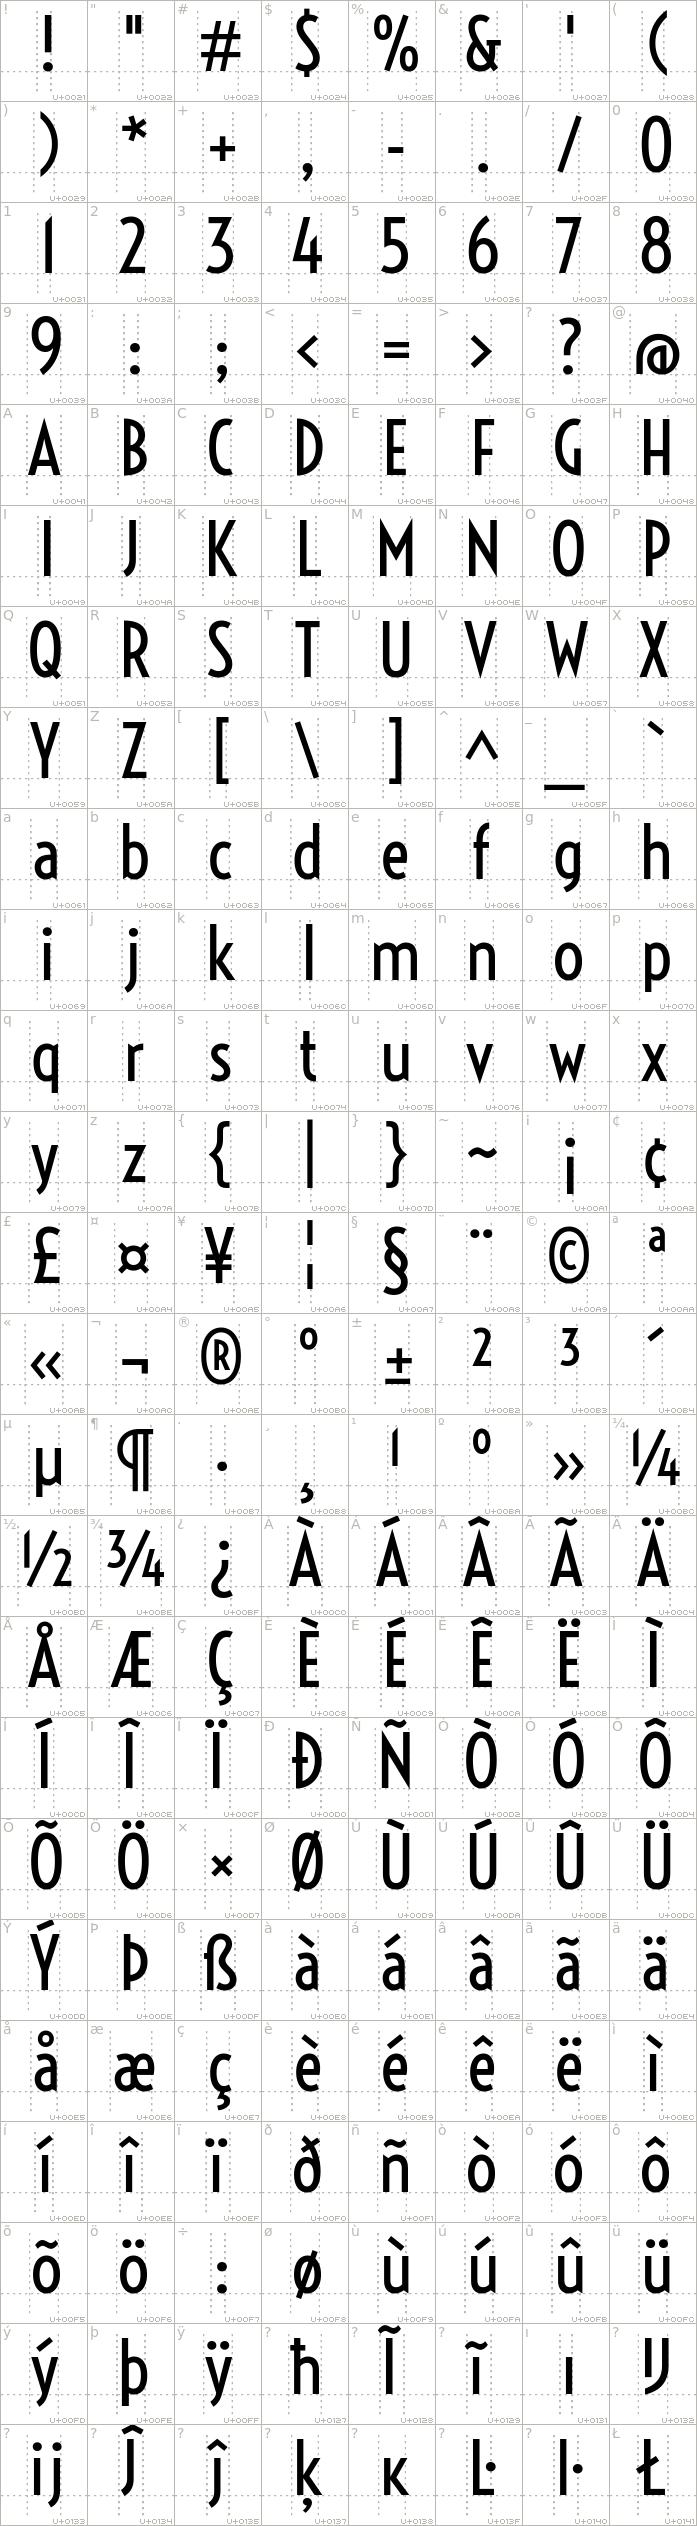 voltaire.regular.character-map-1